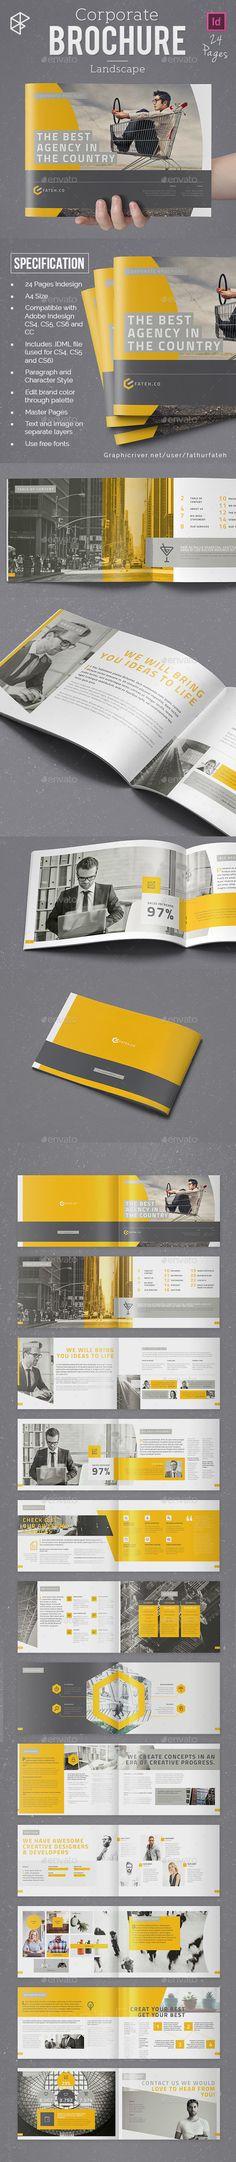 Landscape Corporate Brochure Template InDesign INDD